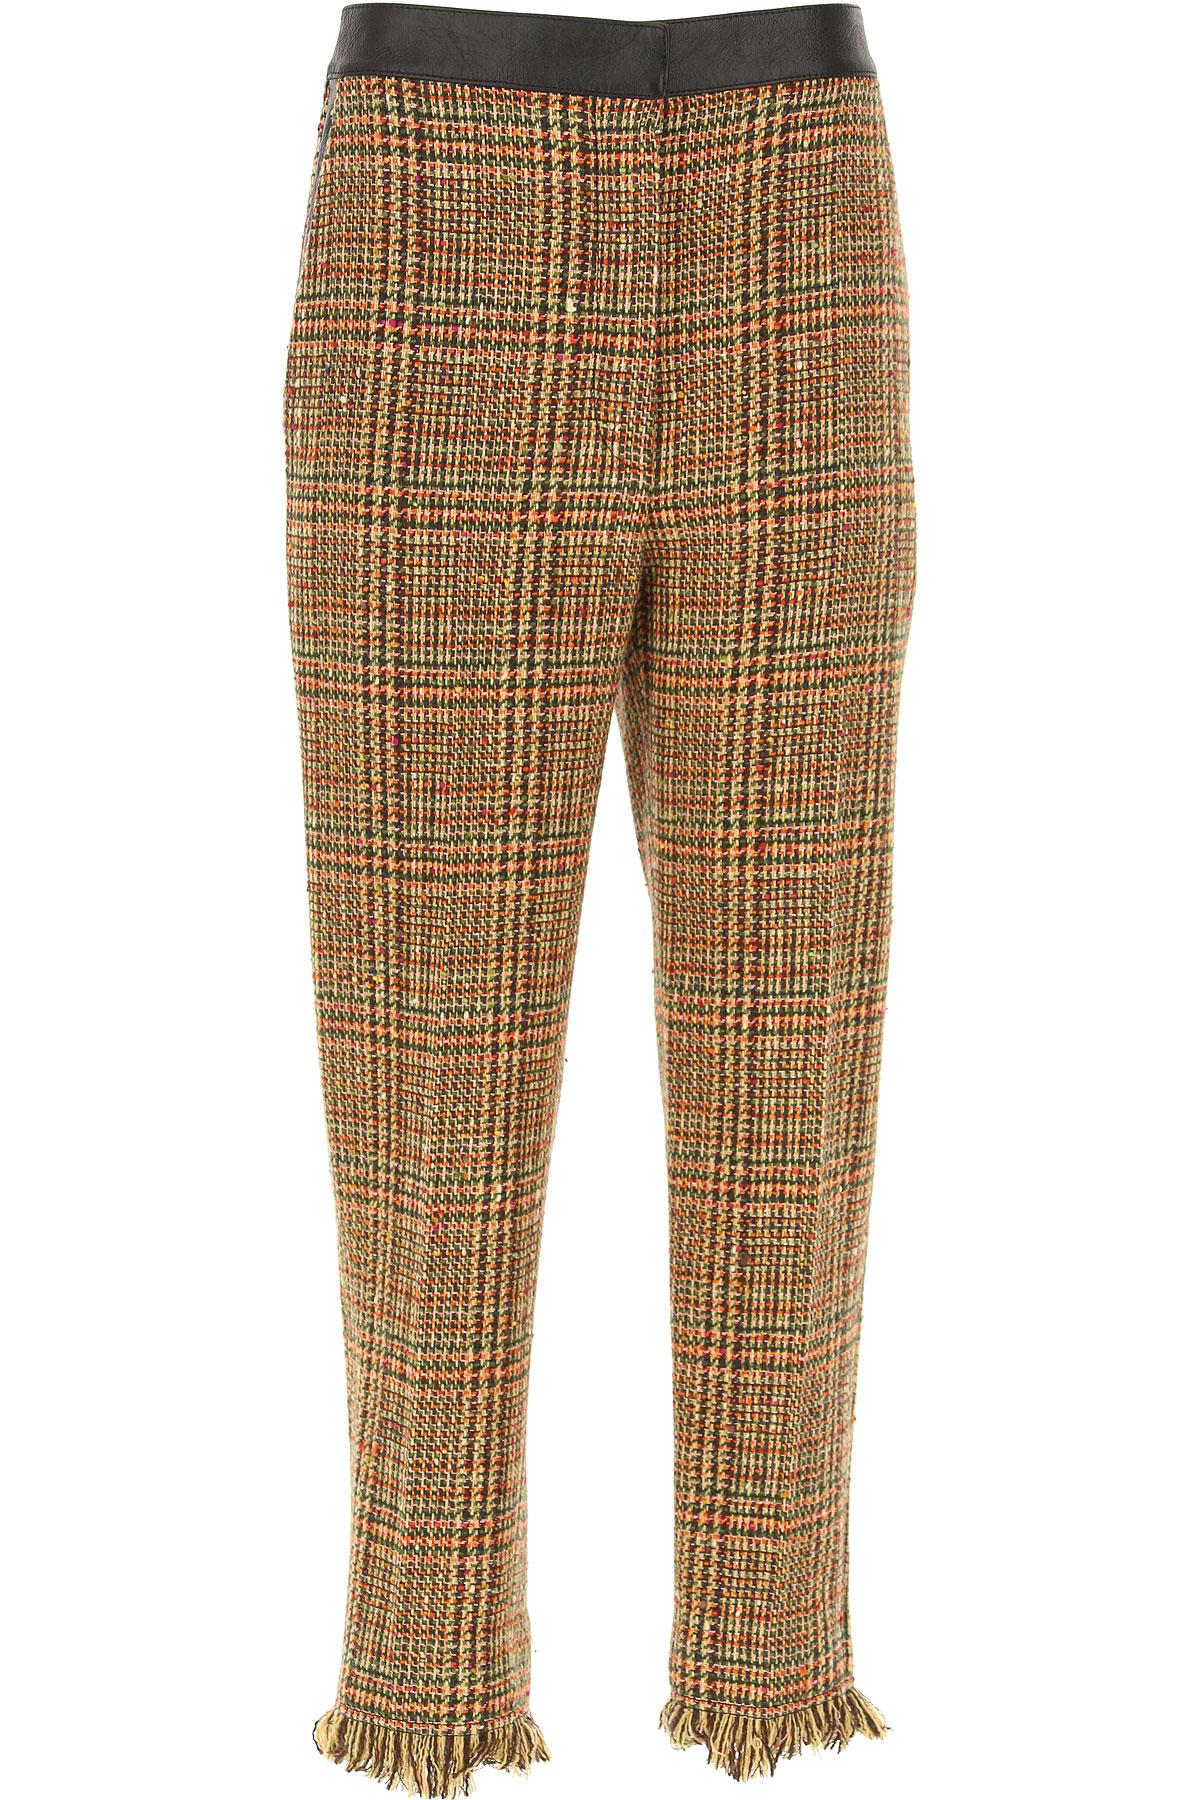 Image of Sonia Rykiel Pants for Women, Multicolor, Wool, 2017, 26 28